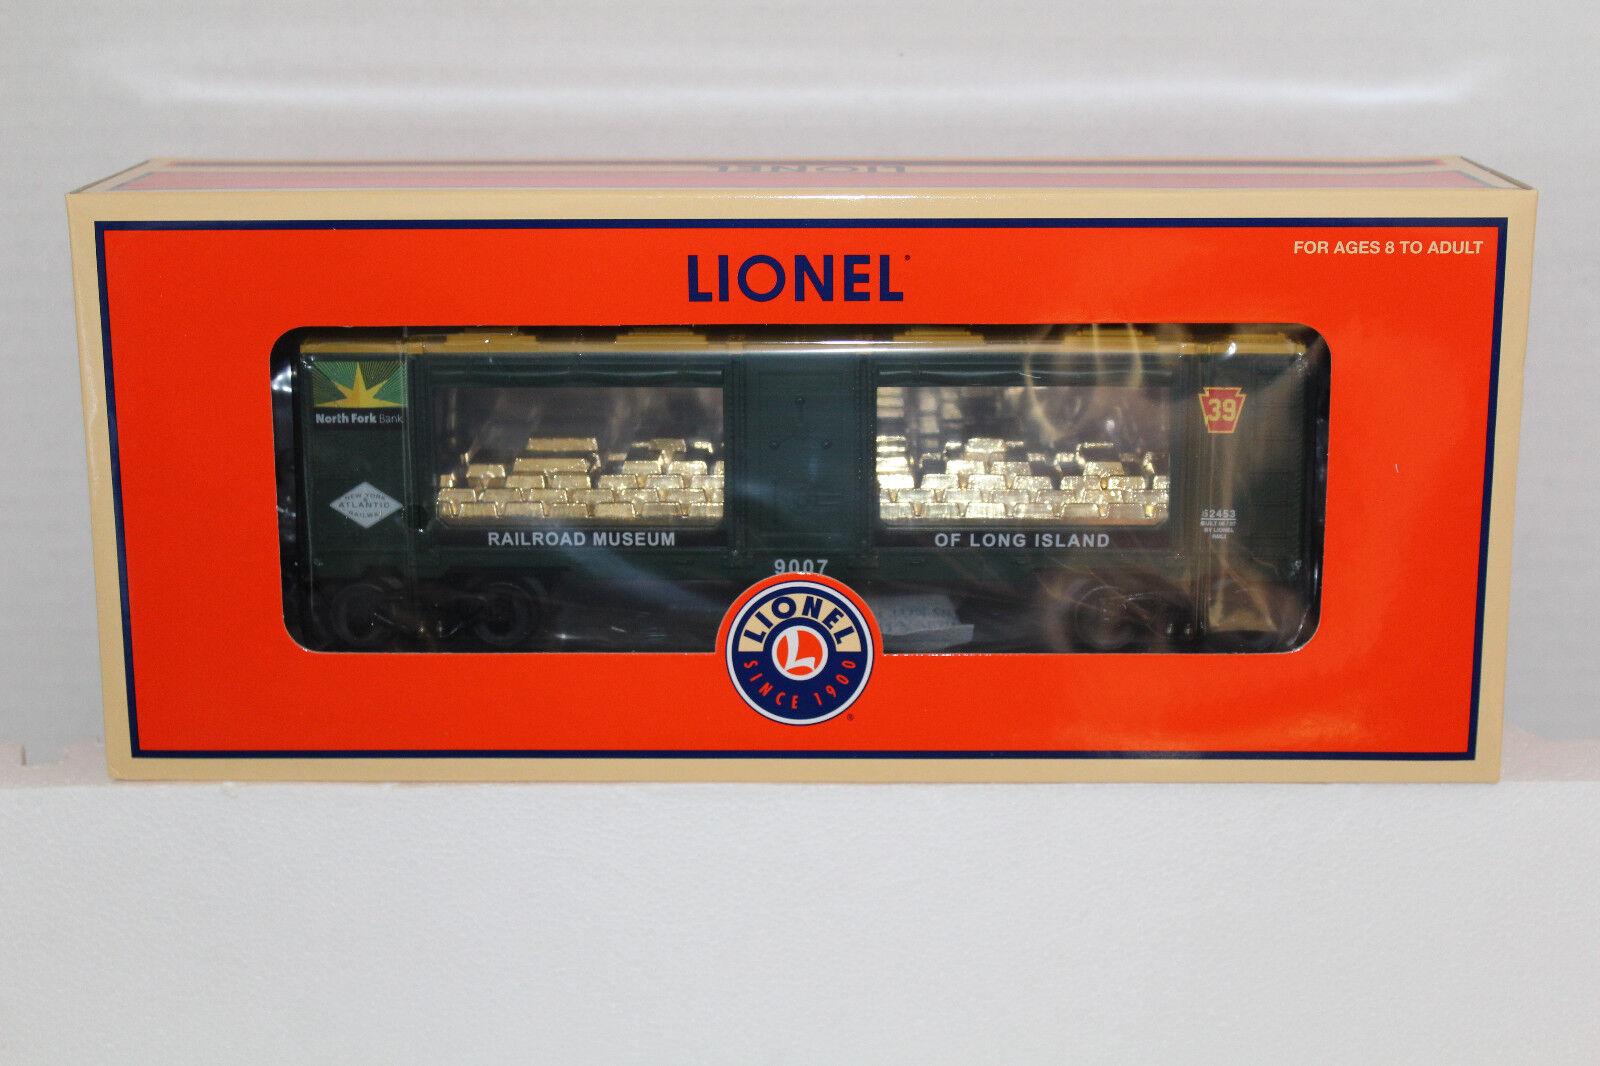 Lionel  52453 railroad museum of long island north folk bank mint car